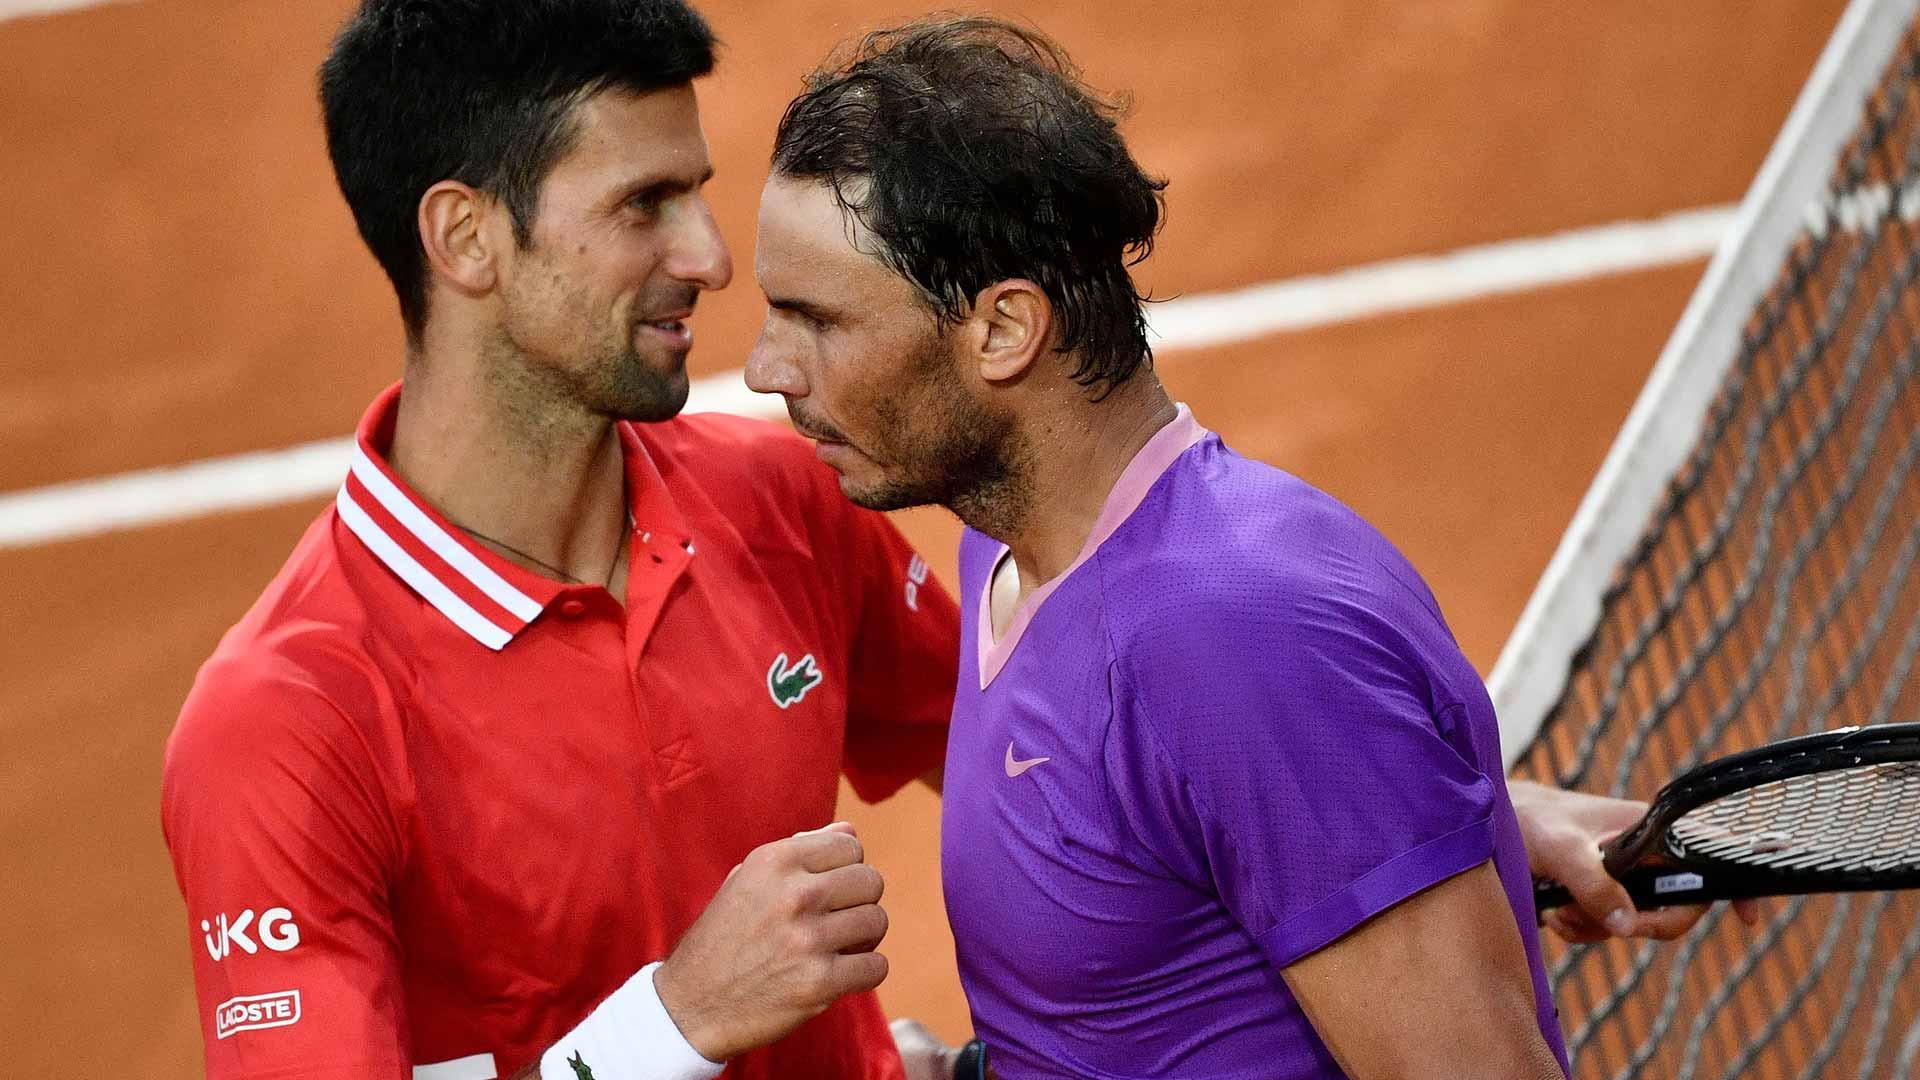 What Has Novak Djokovic Done Better Than Rafael Nadal At Roland Garros Atp Tour Tennis